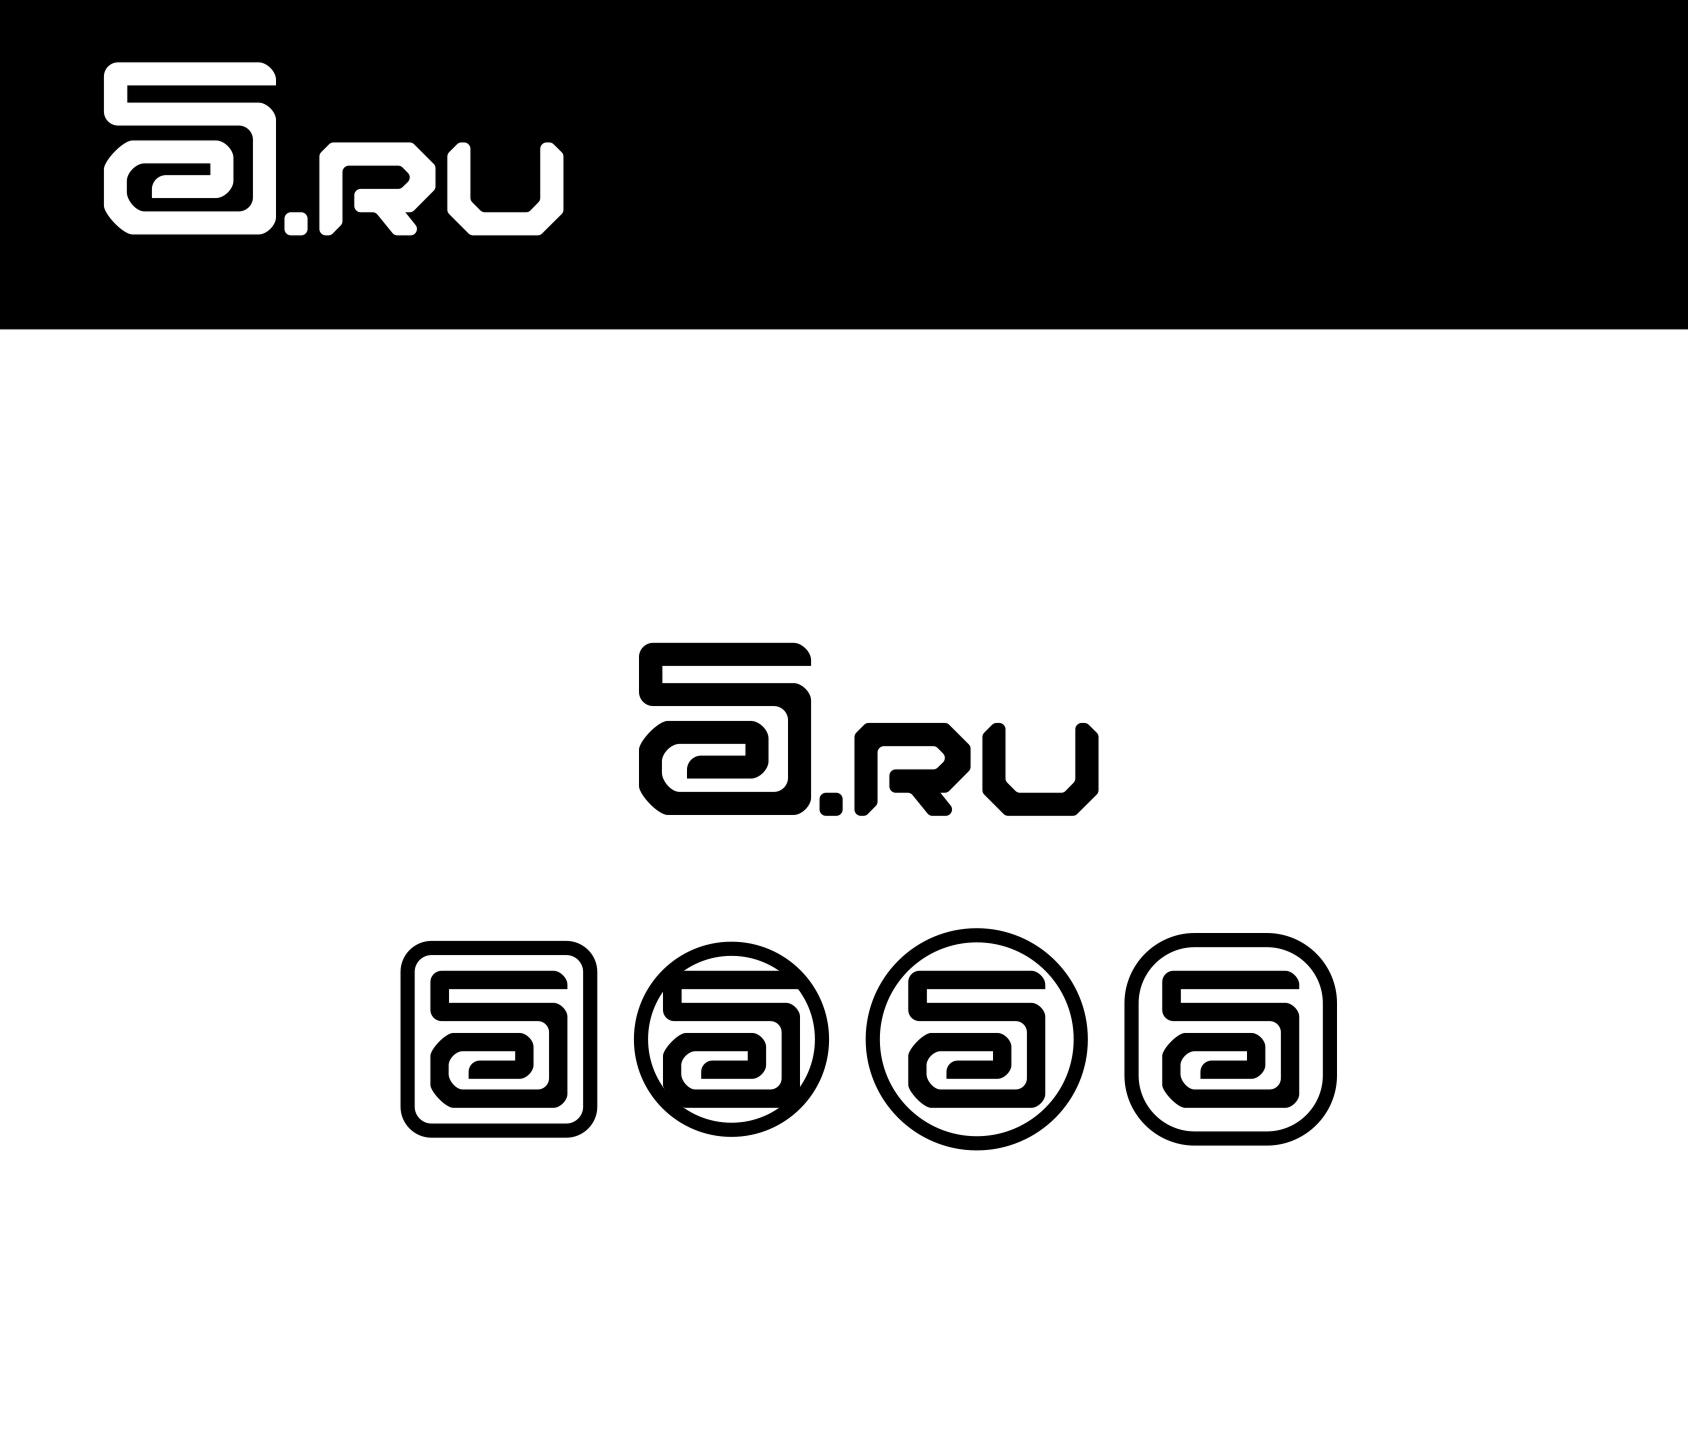 Нарисовать логотип для группы компаний  фото f_8995cdda47e6fff4.jpg